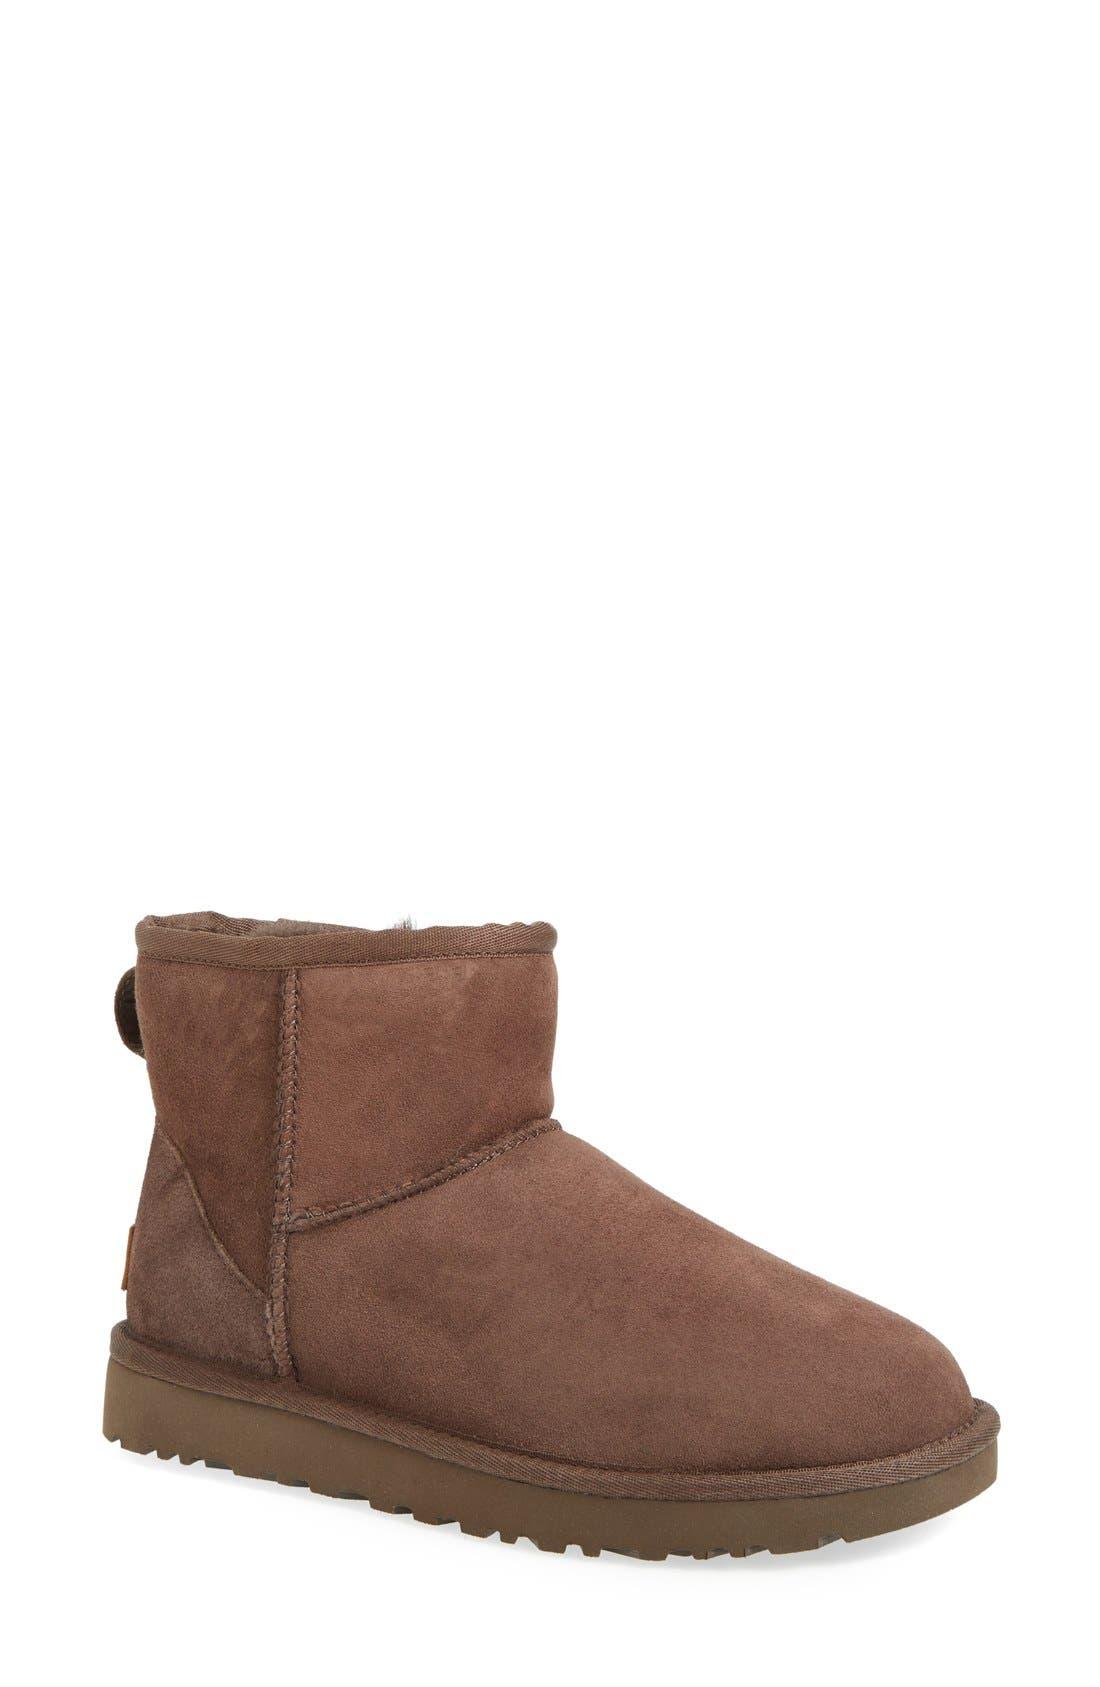 Alternate Image 1 Selected - UGG® 'Classic Mini II' Genuine Shearling Lined Boot (Women)